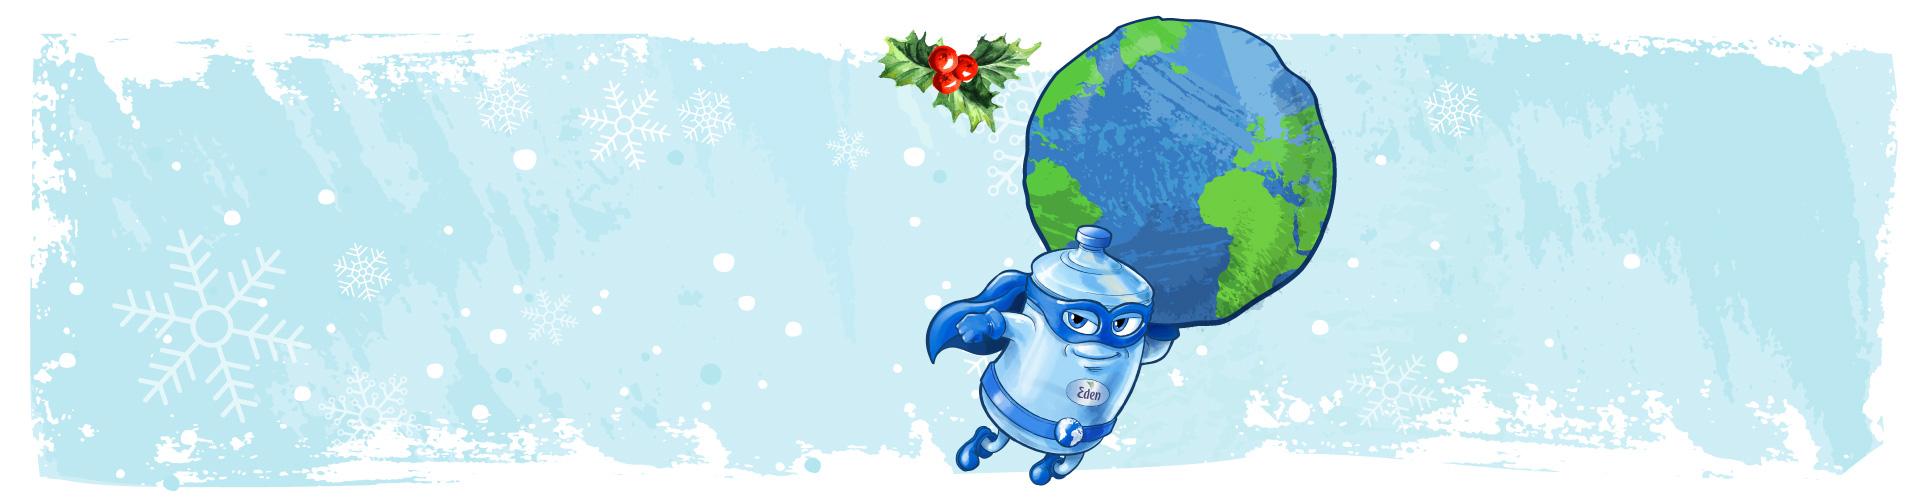 Eden Springs vesi - Ole meie planeedi kangelane nende Jõulupühade ajal